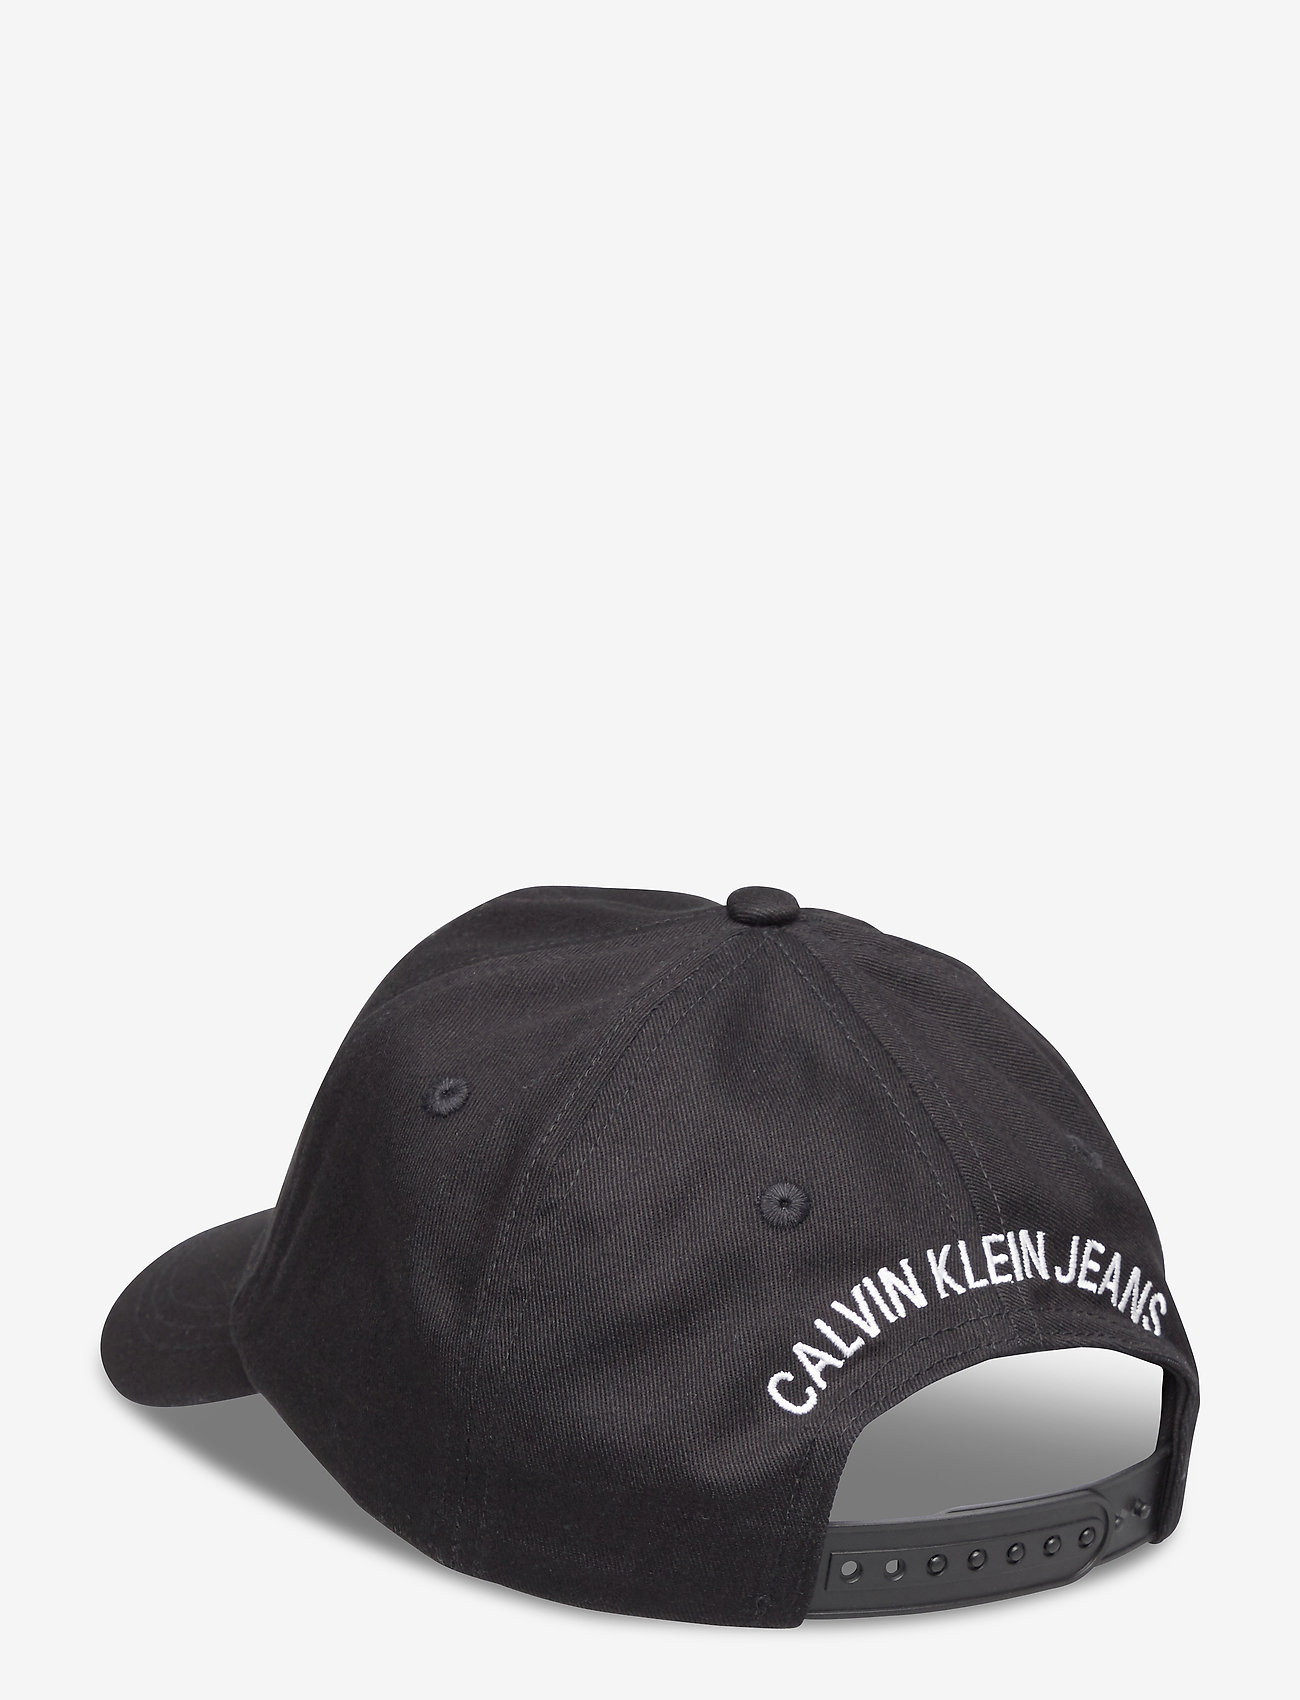 Calvin Klein - MONOGRAM BASEBALL CAP - czapki - ck black - 1